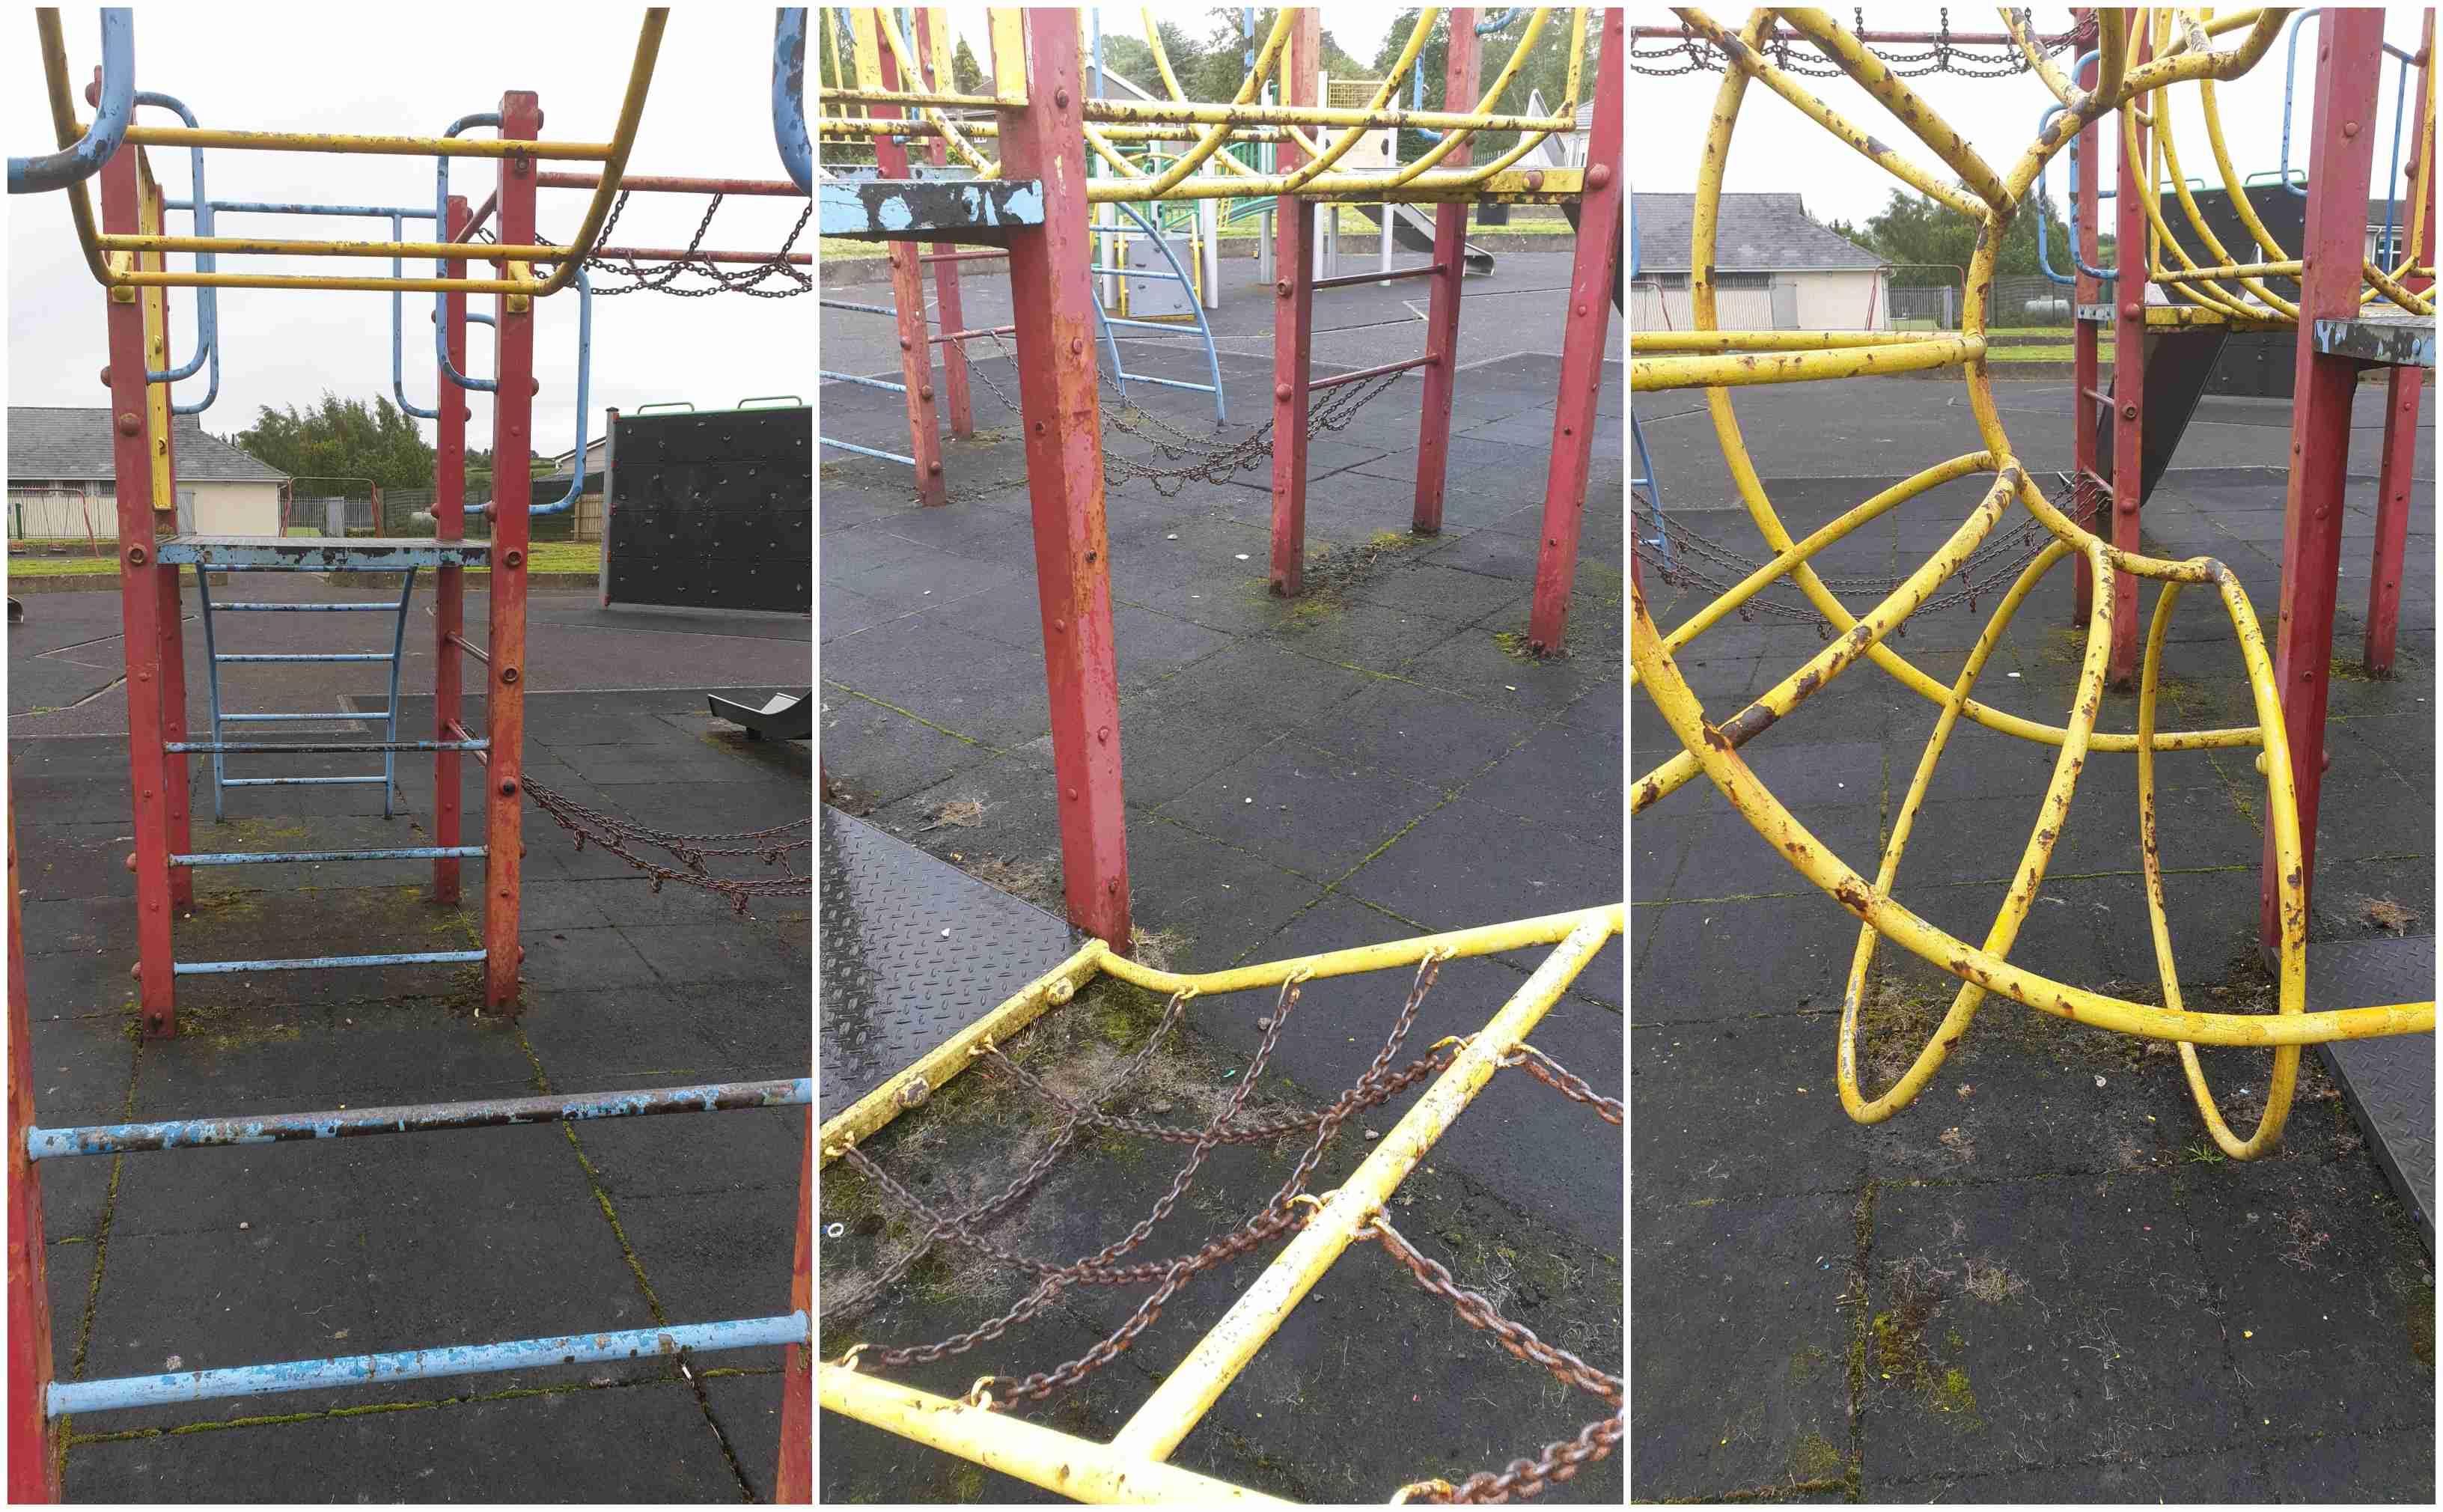 Markethill play park